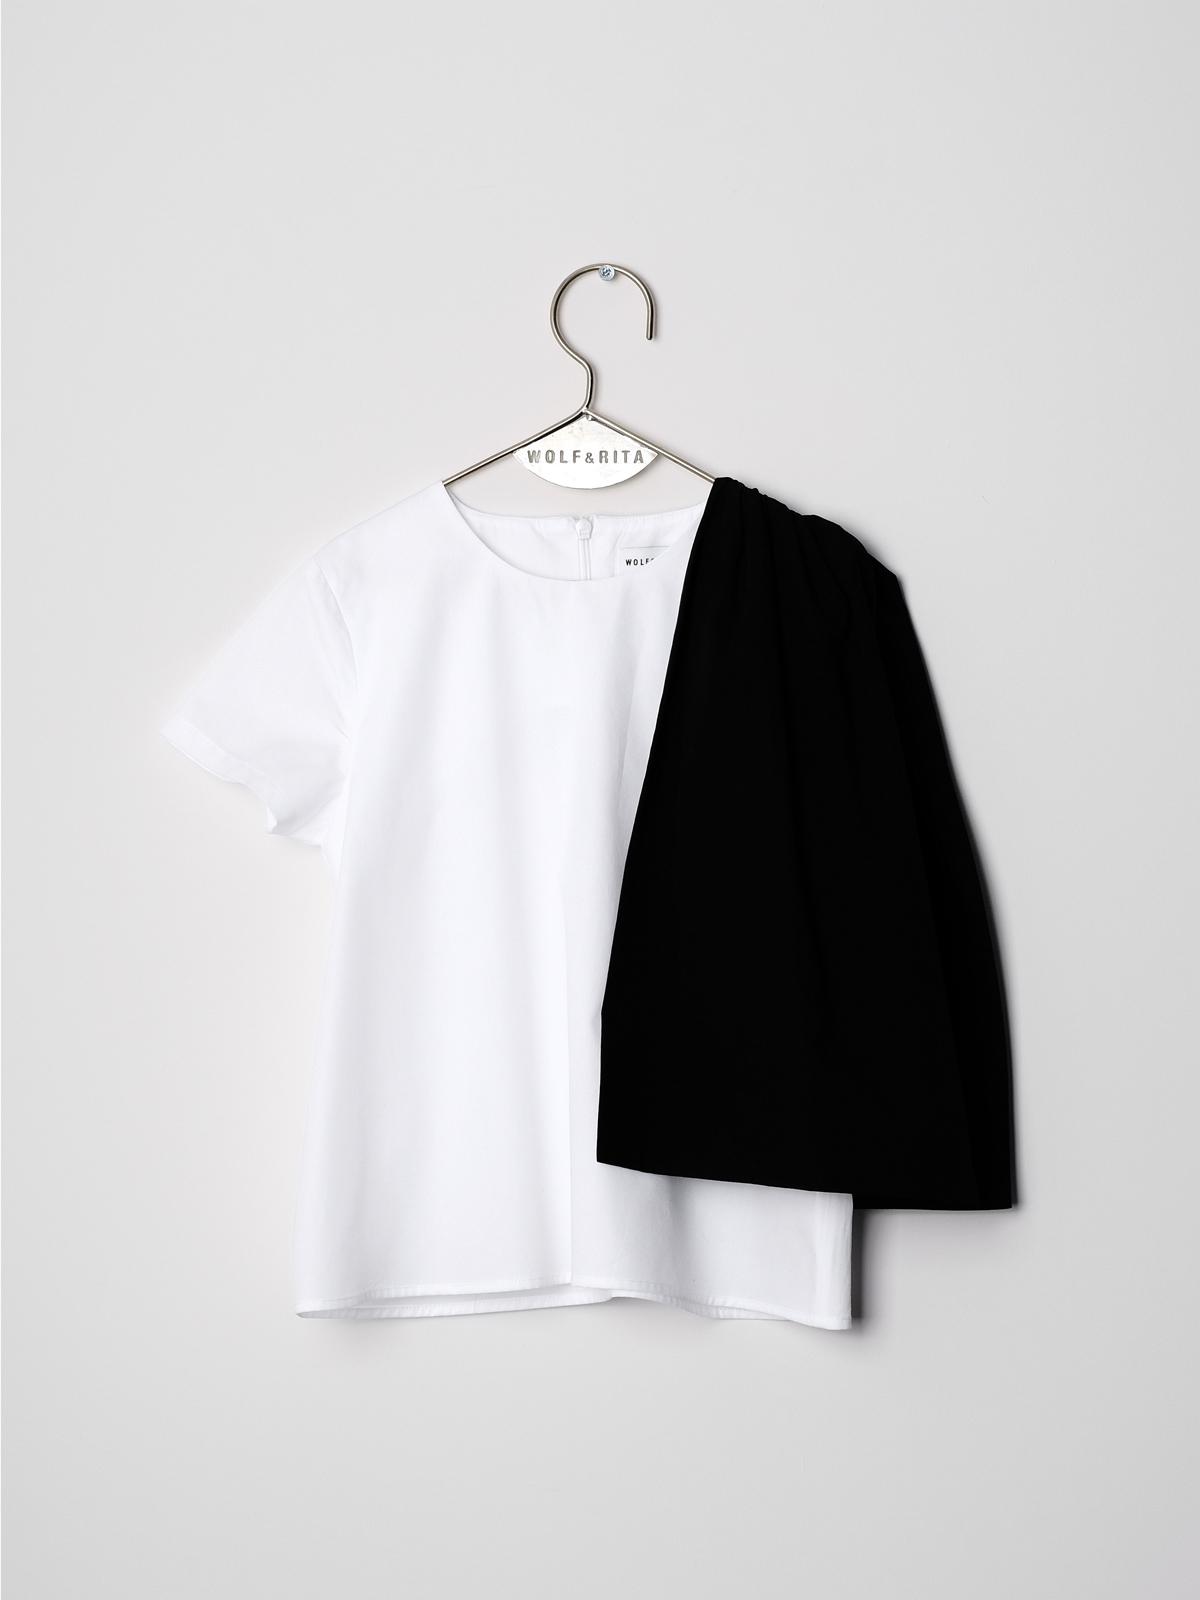 《WOLF & RITA 2018SS》ADELIA blouse / white × black(日本別注) / 2-8Y